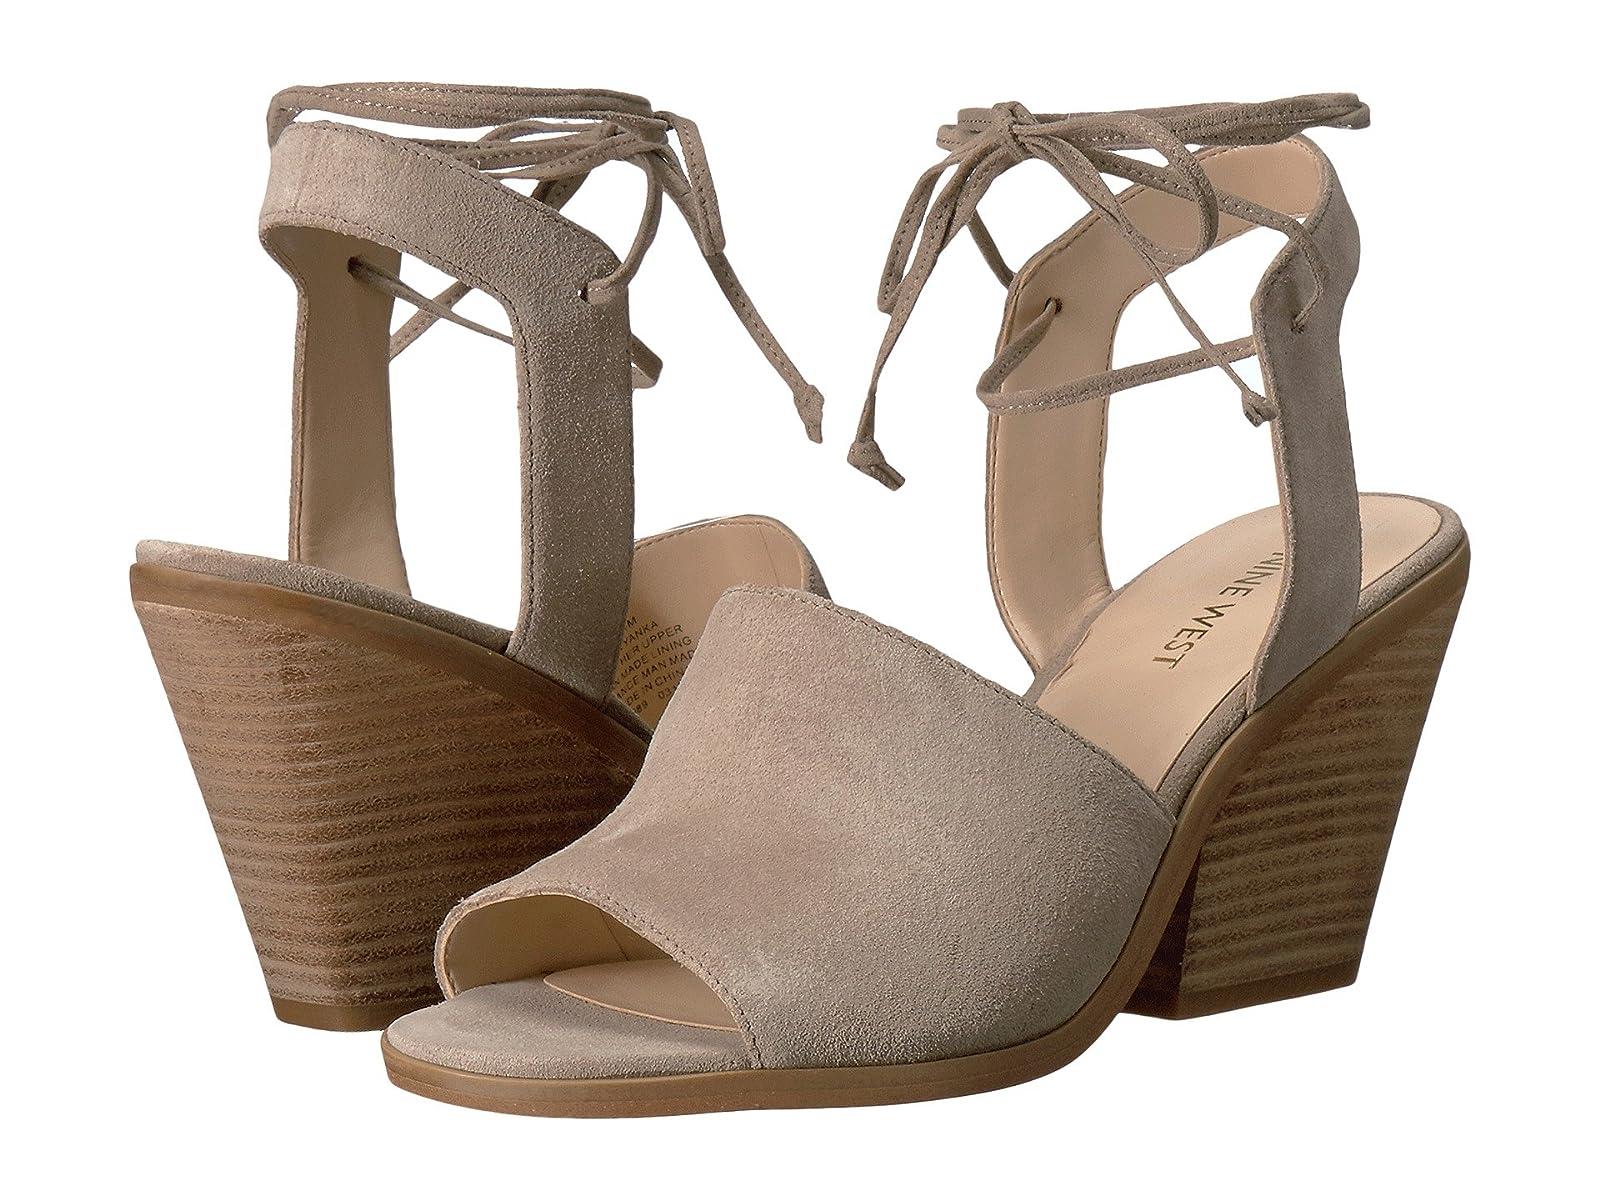 Nine West YankaCheap and distinctive eye-catching shoes